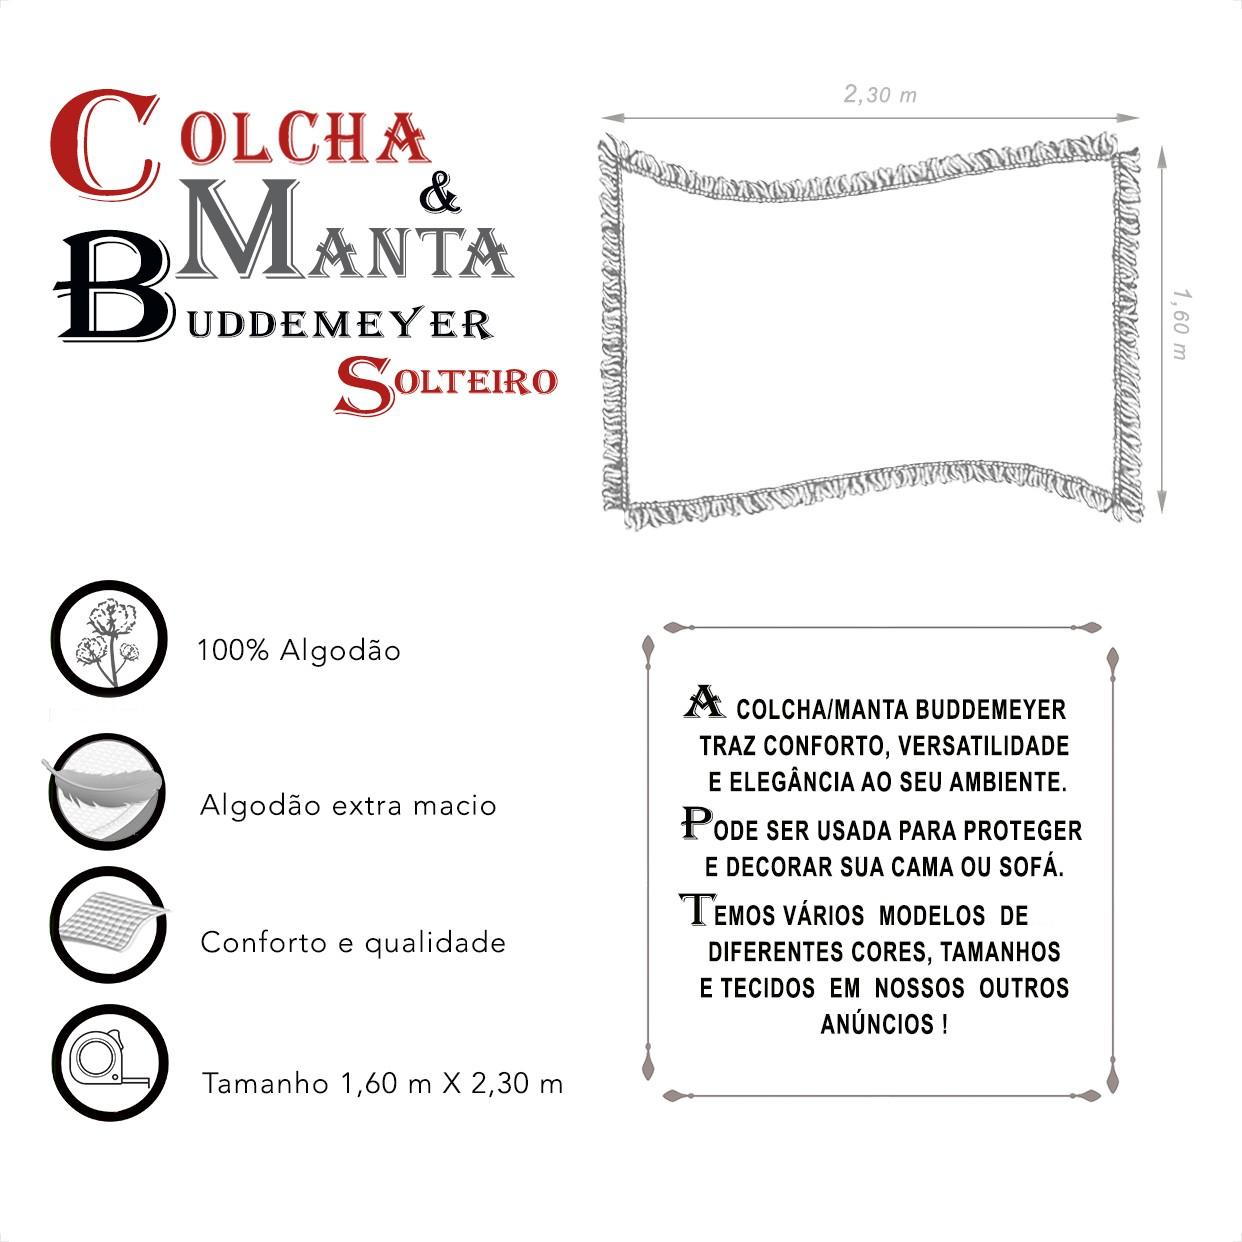 Manta e Colcha Buddemeyer Solteiro Cinza Claro 1,60m x 2,30m